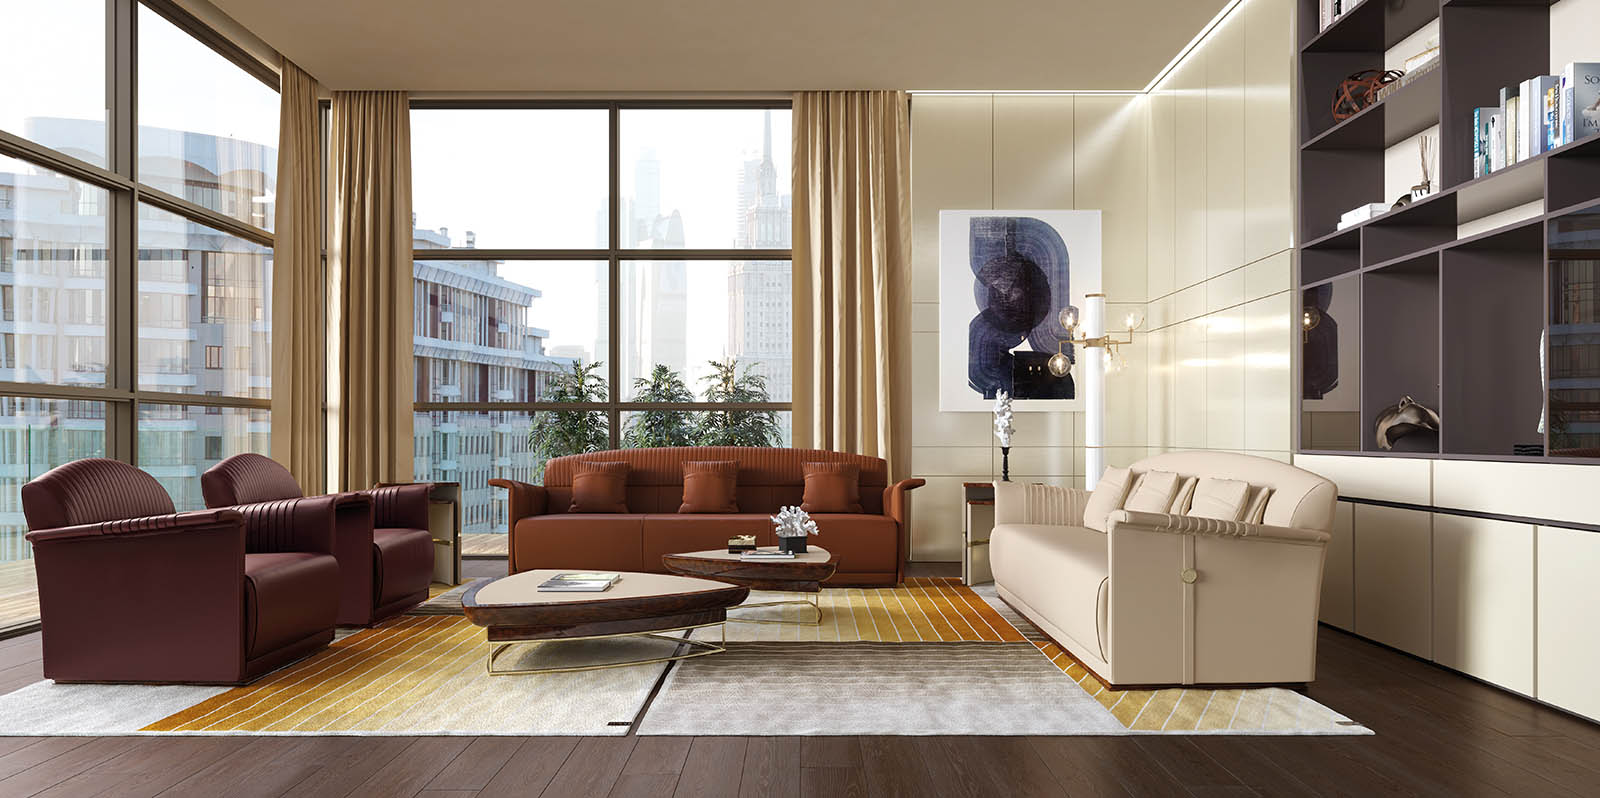 Saloni milano shanghai 2017 art design group for Art design milano